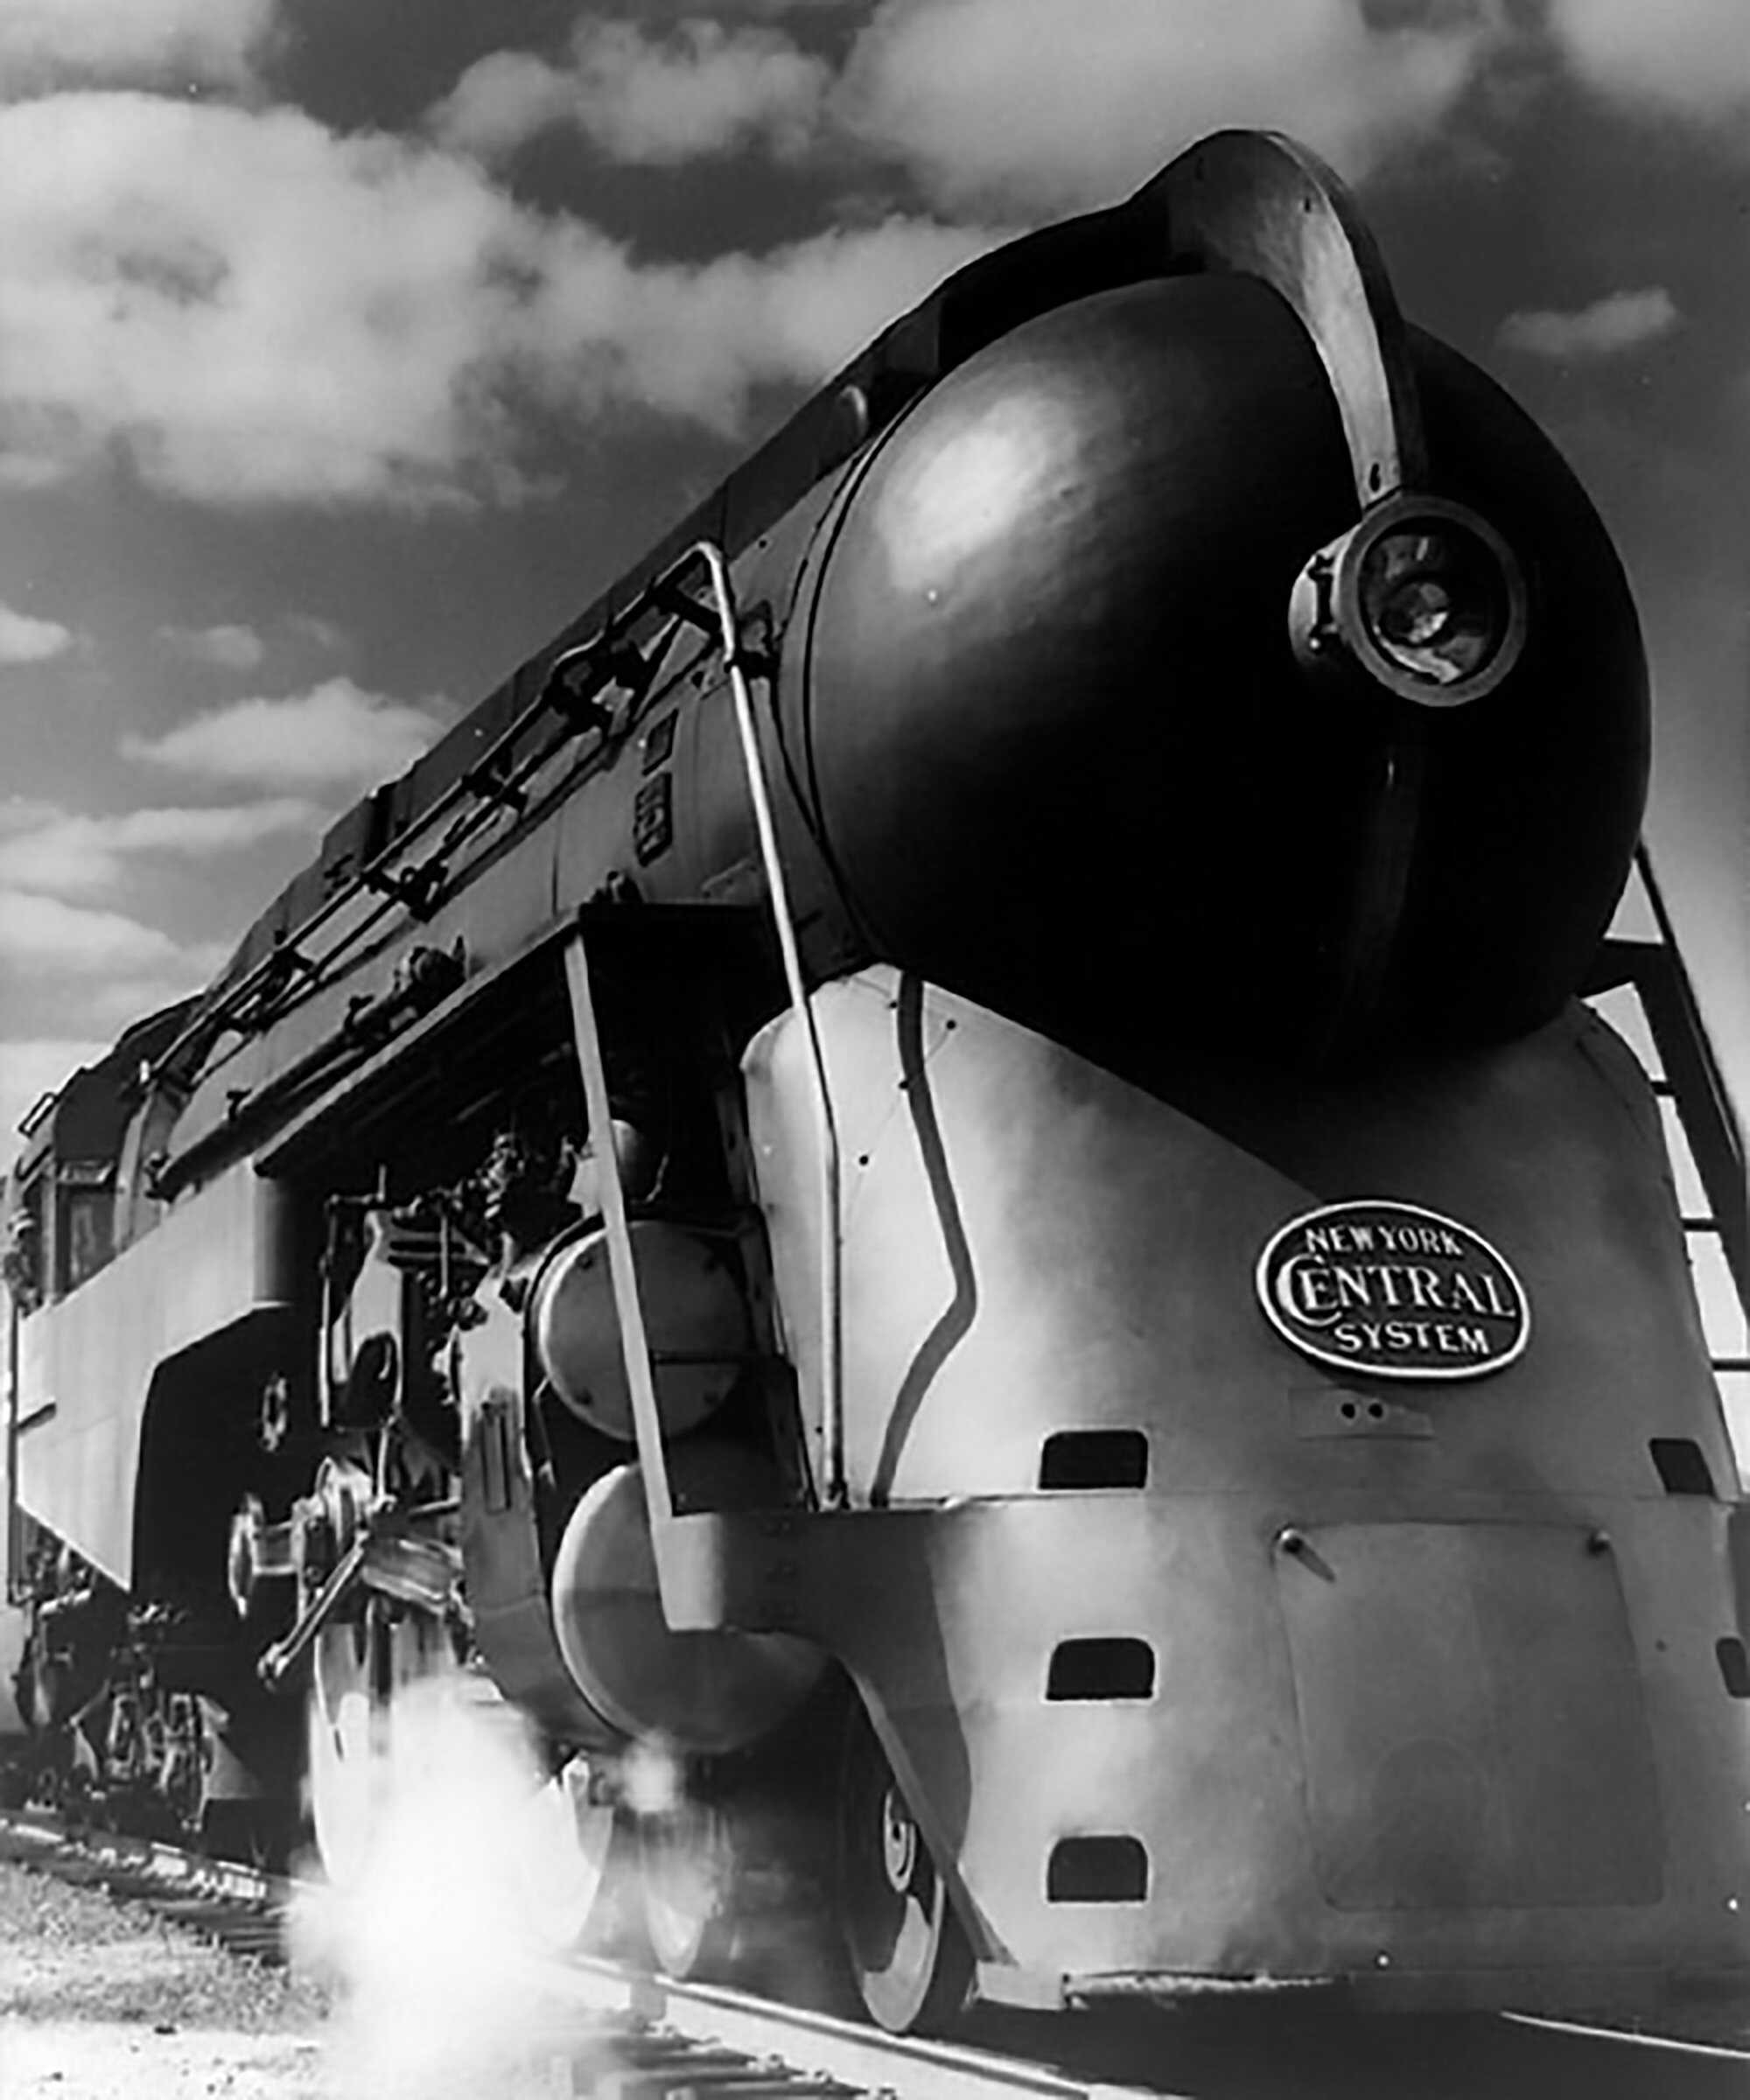 Grand-central-20th-Century-locomotive-LOC-.jpg